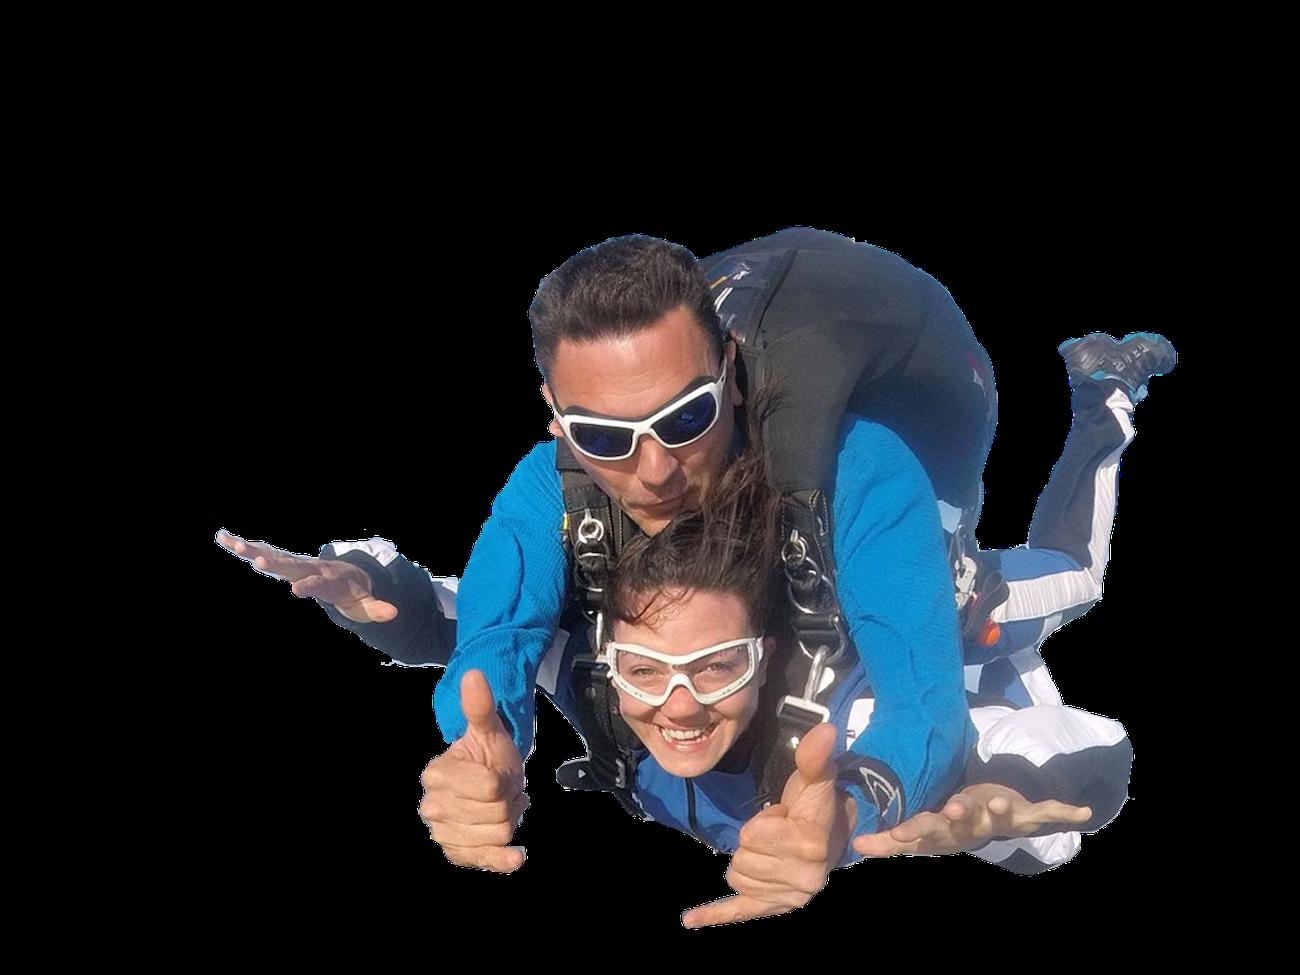 image parachute